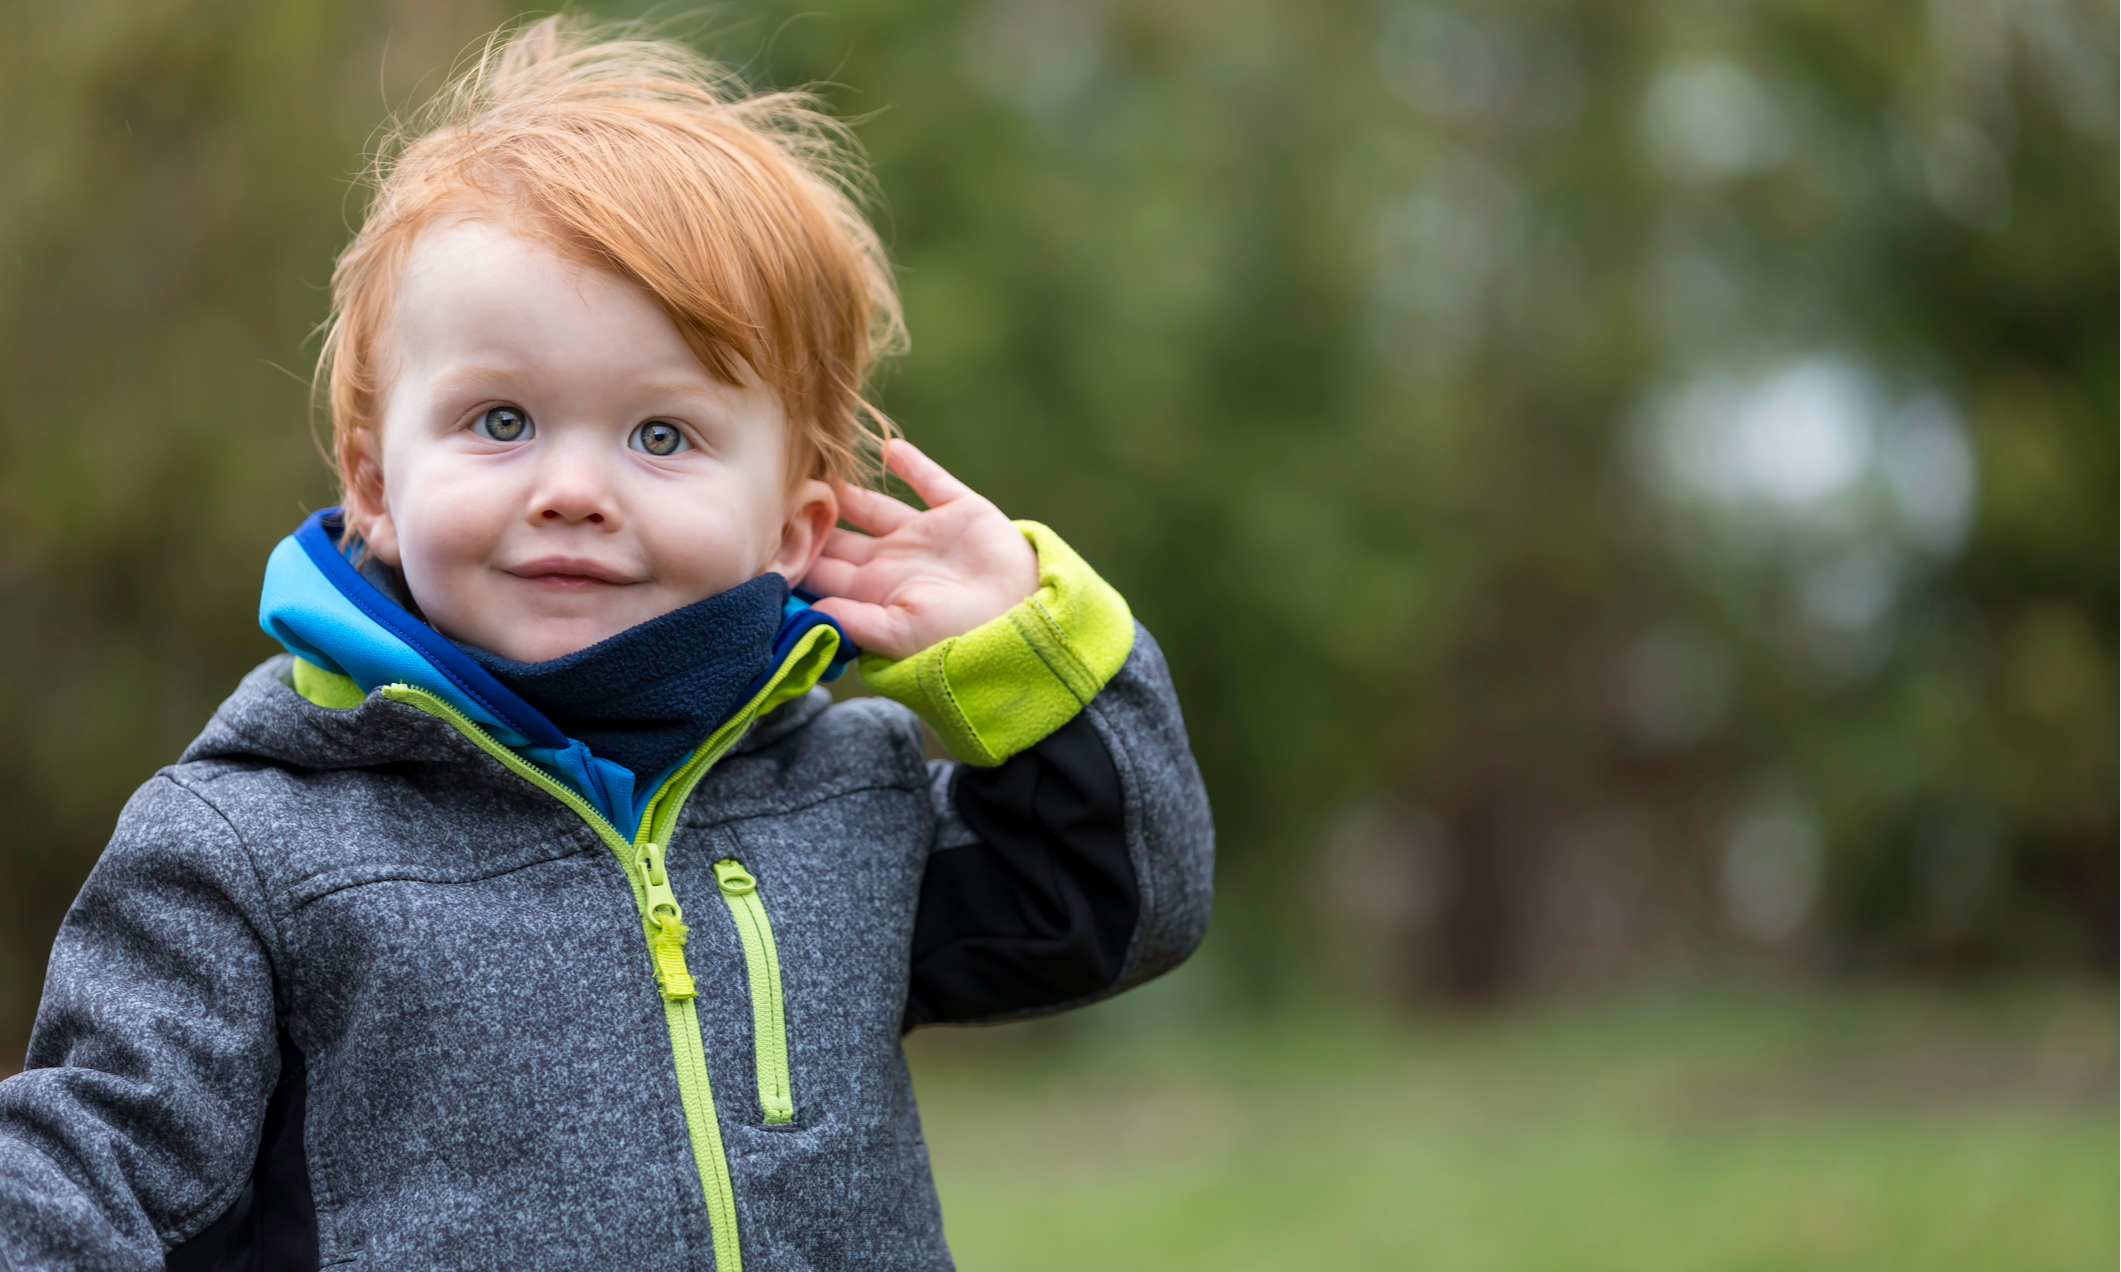 Развитие слуха у ребенка от рождения до года